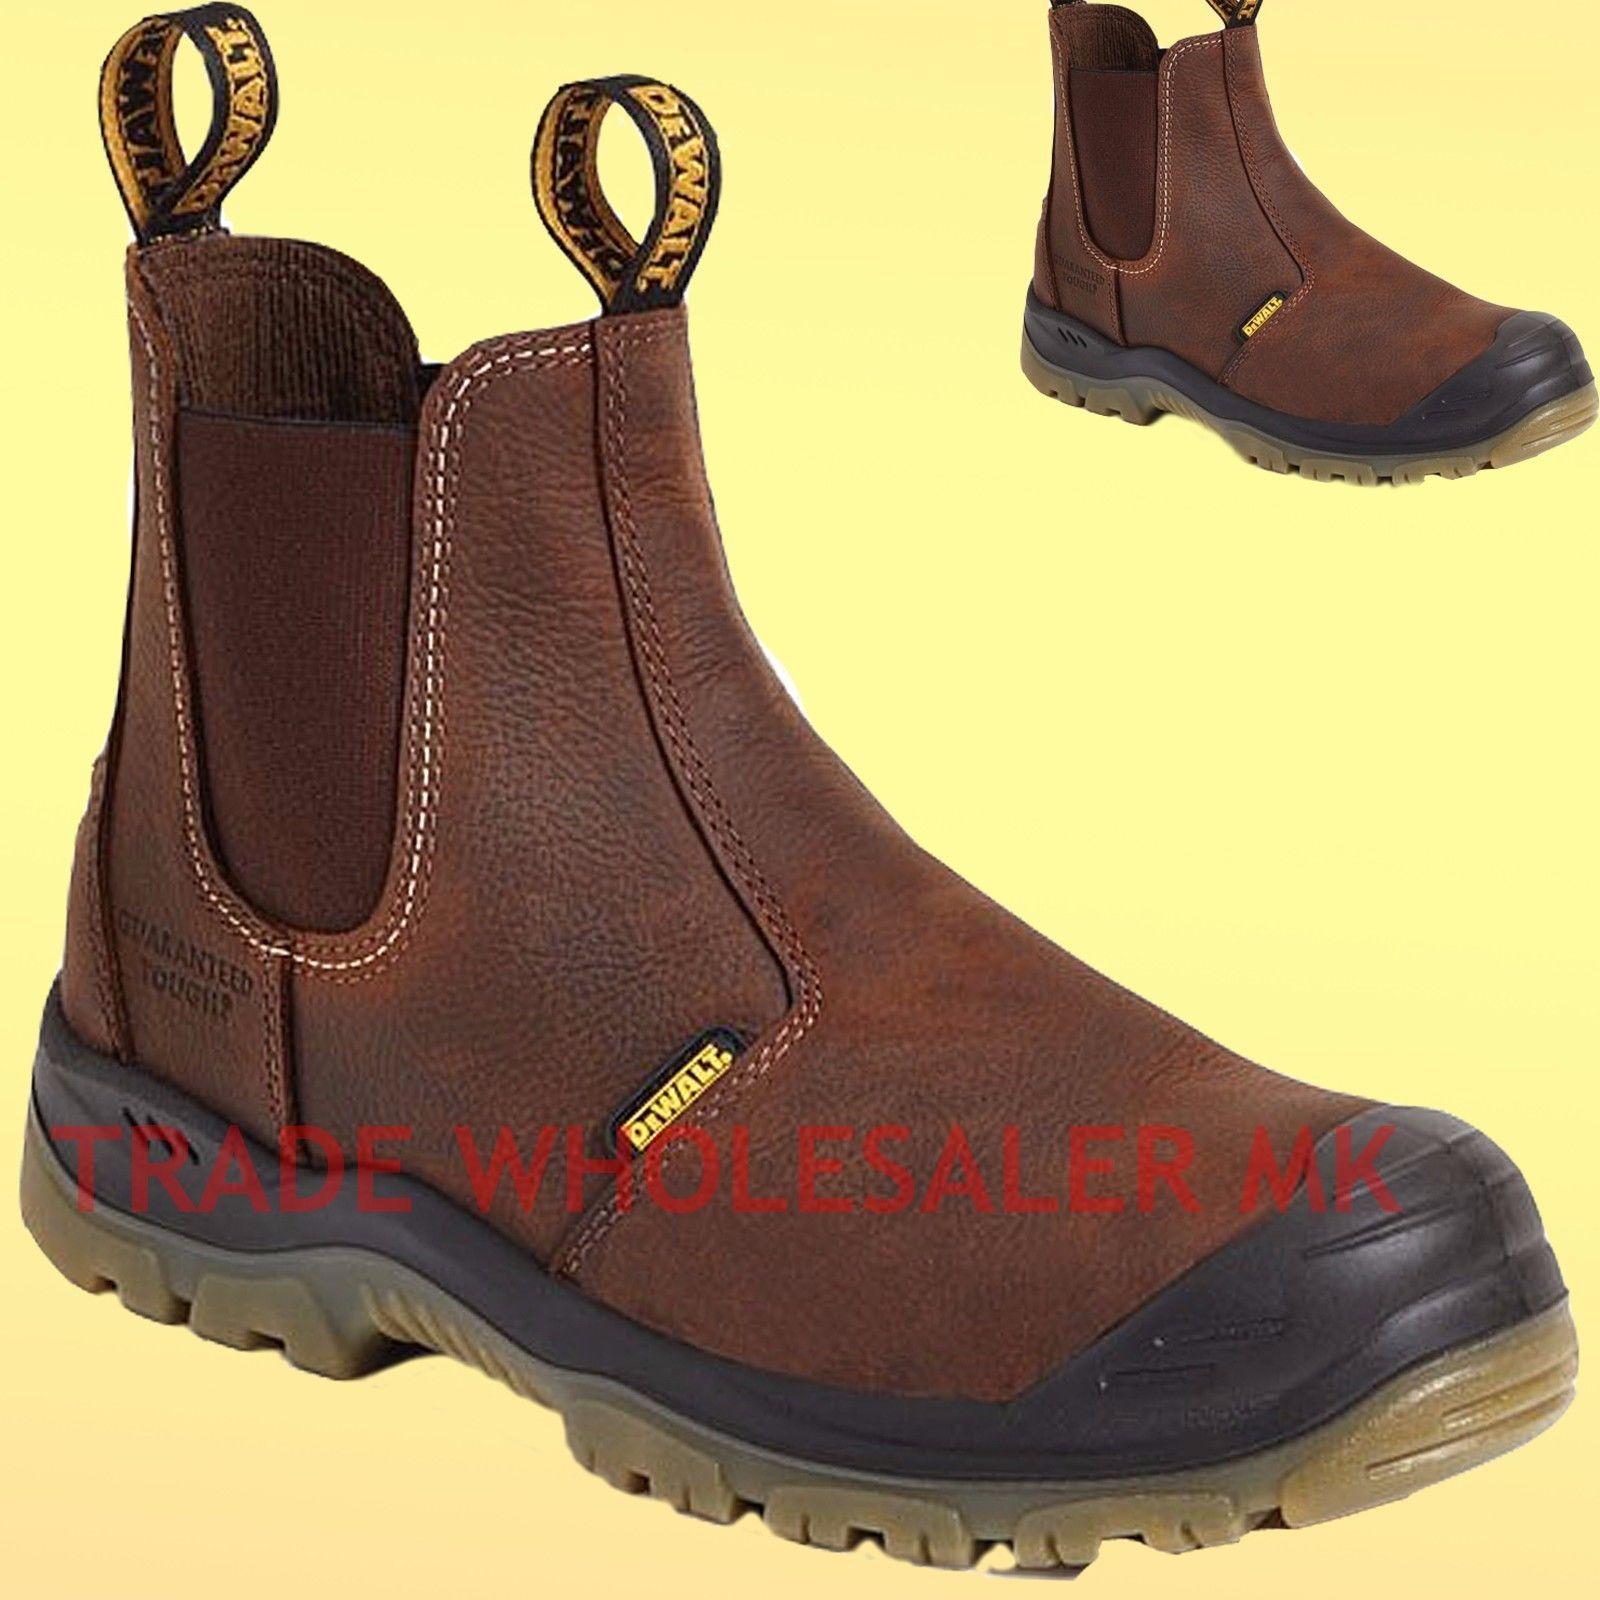 d5d461eaef9 DeWalt Mens Nitrogen Steel Toe S3 Safety Dealer Slip On Work Boots Chelsea  boot